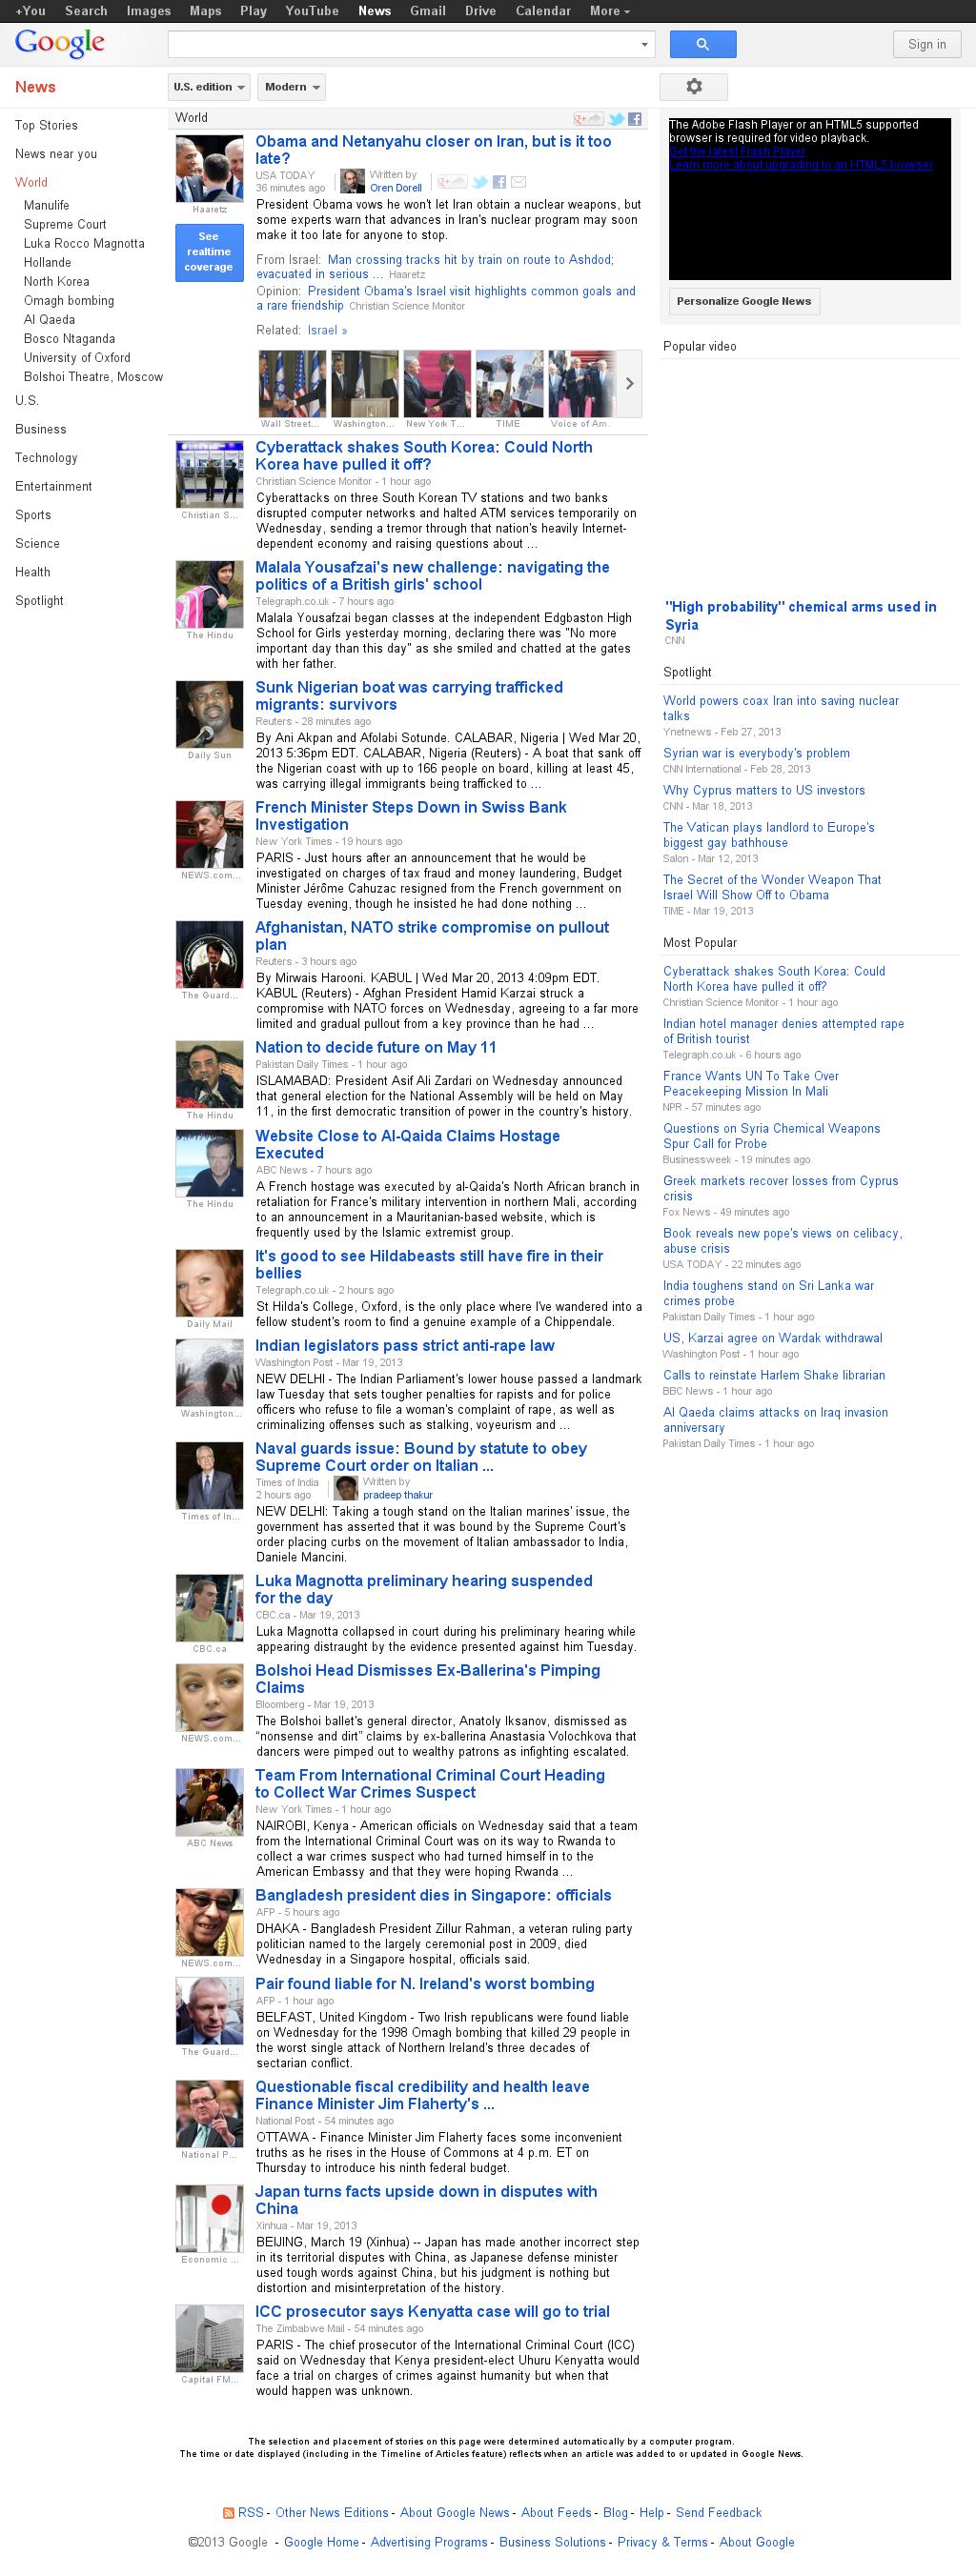 Google News: World at Wednesday March 20, 2013, 10:08 p.m. UTC